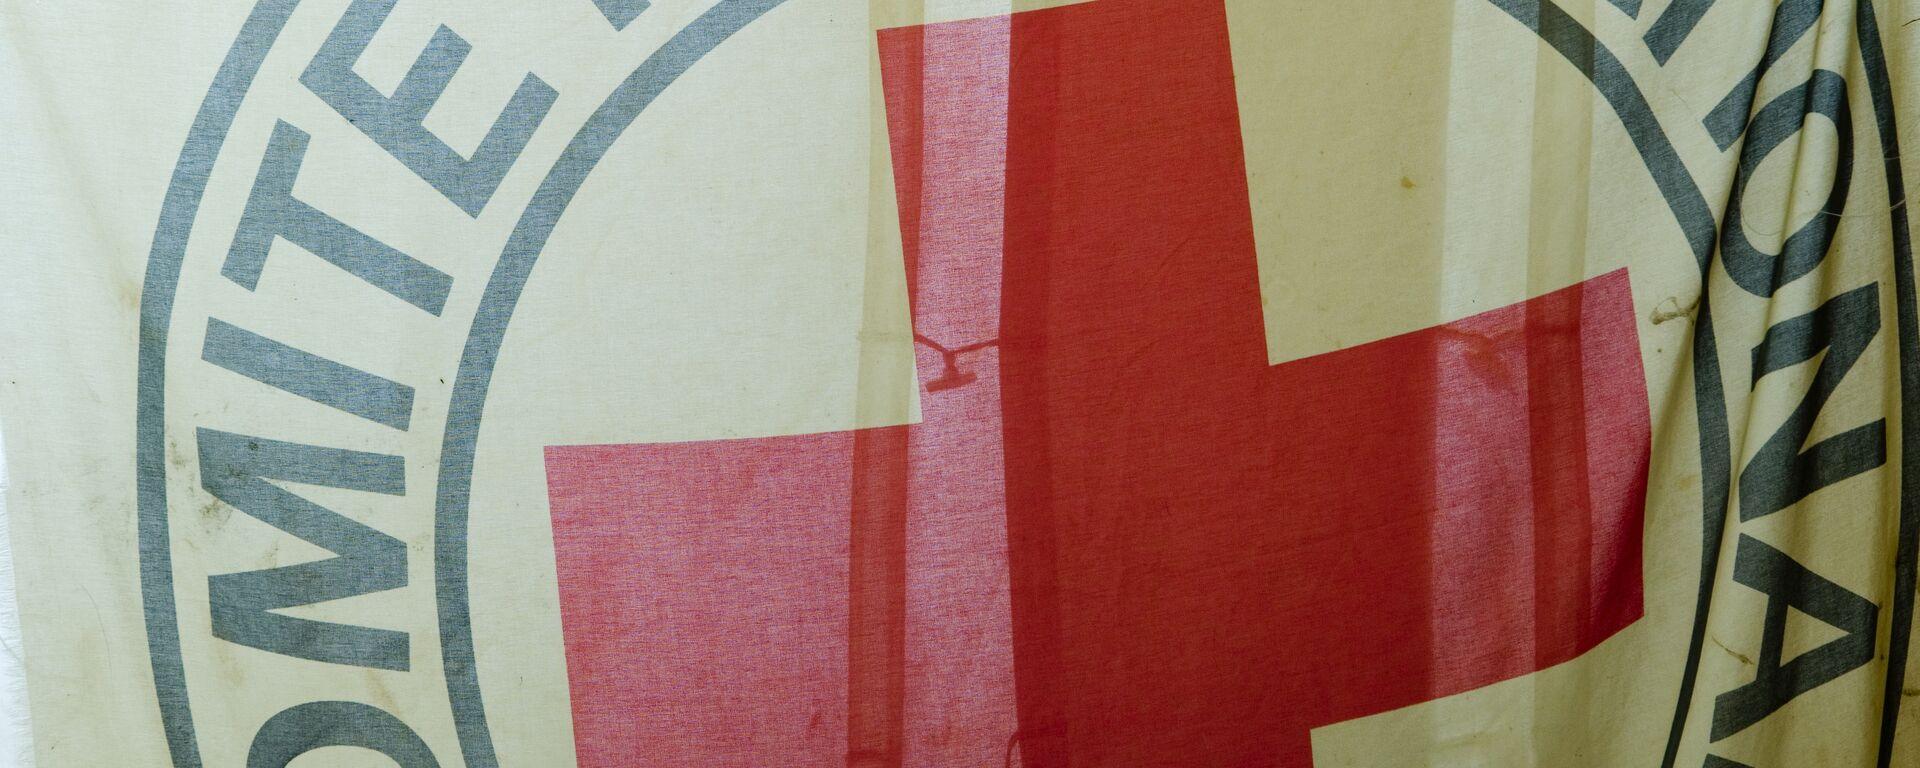 Comité Internacional de la Cruz Roja (CICR) - Sputnik Mundo, 1920, 21.09.2021